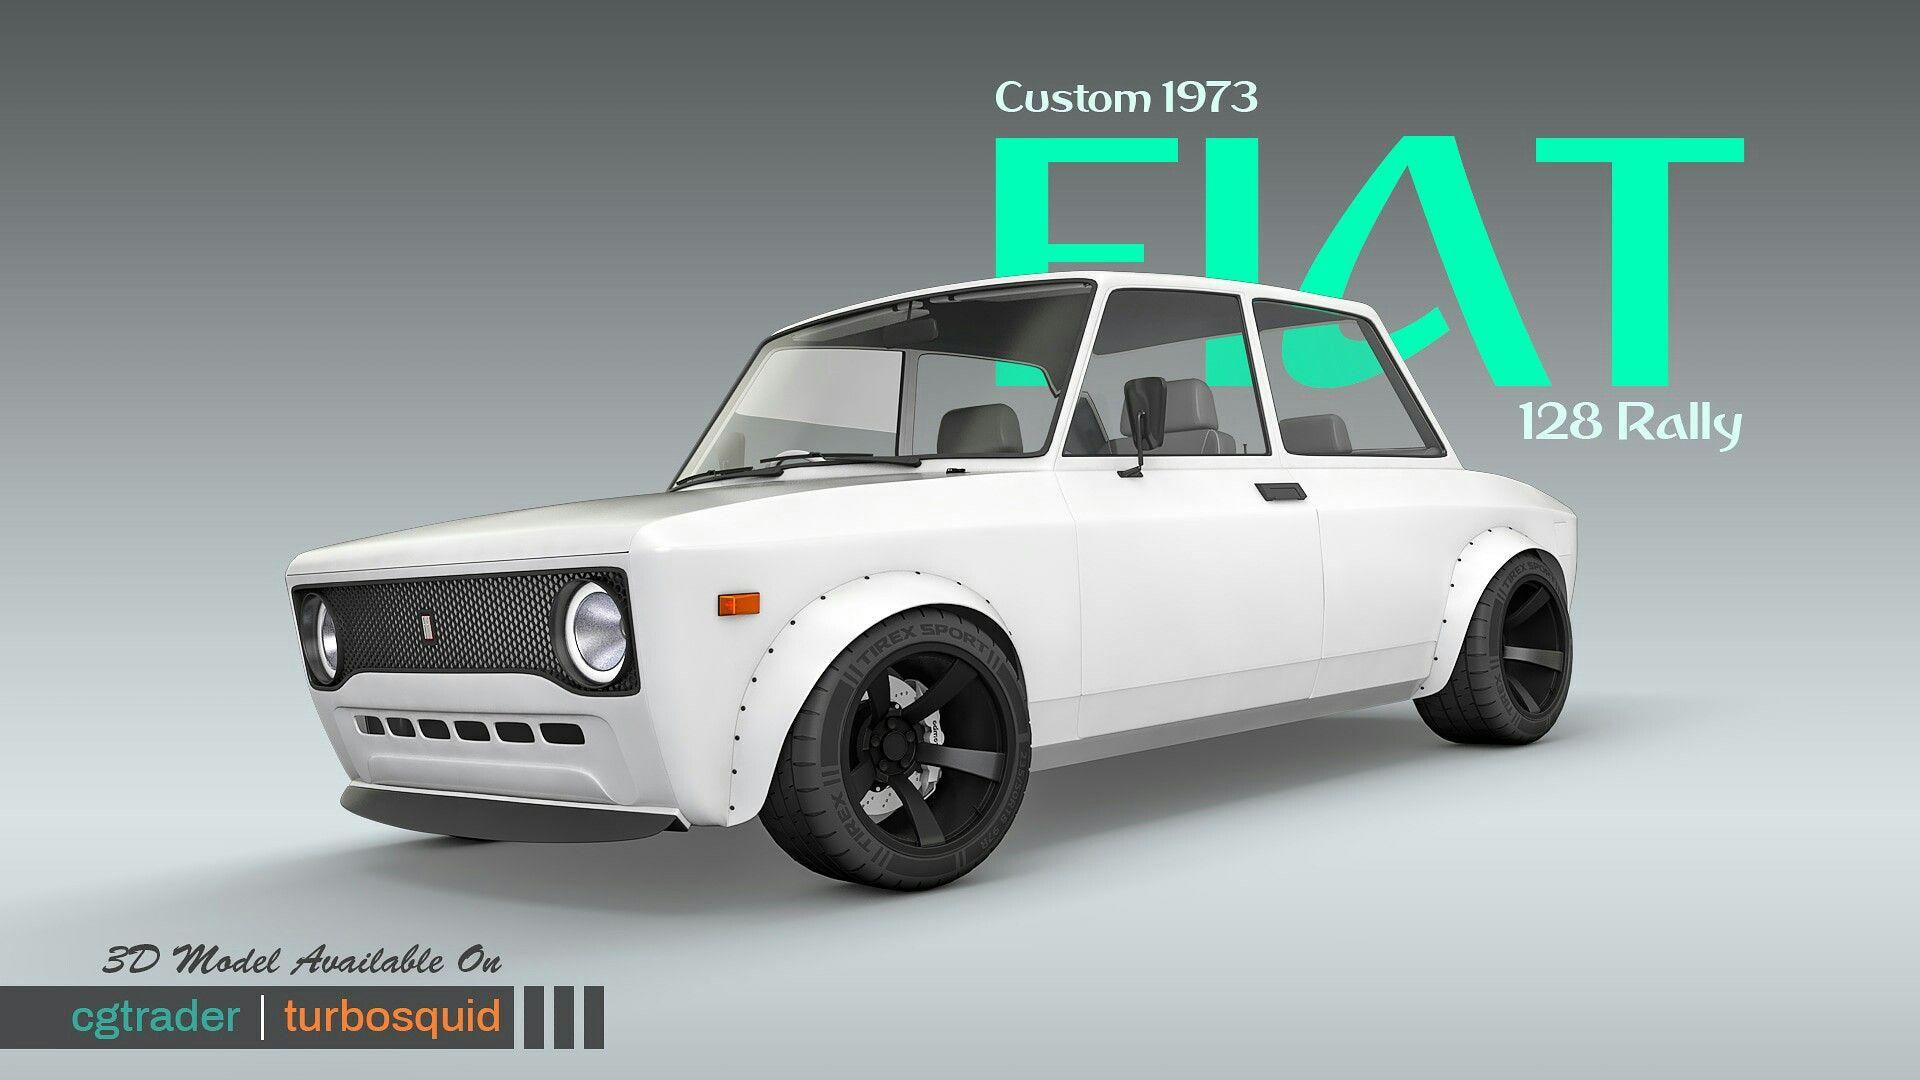 Custom 1973 Fiat 128 Rally 3d Model Fiat 128 Fiat 3d Model